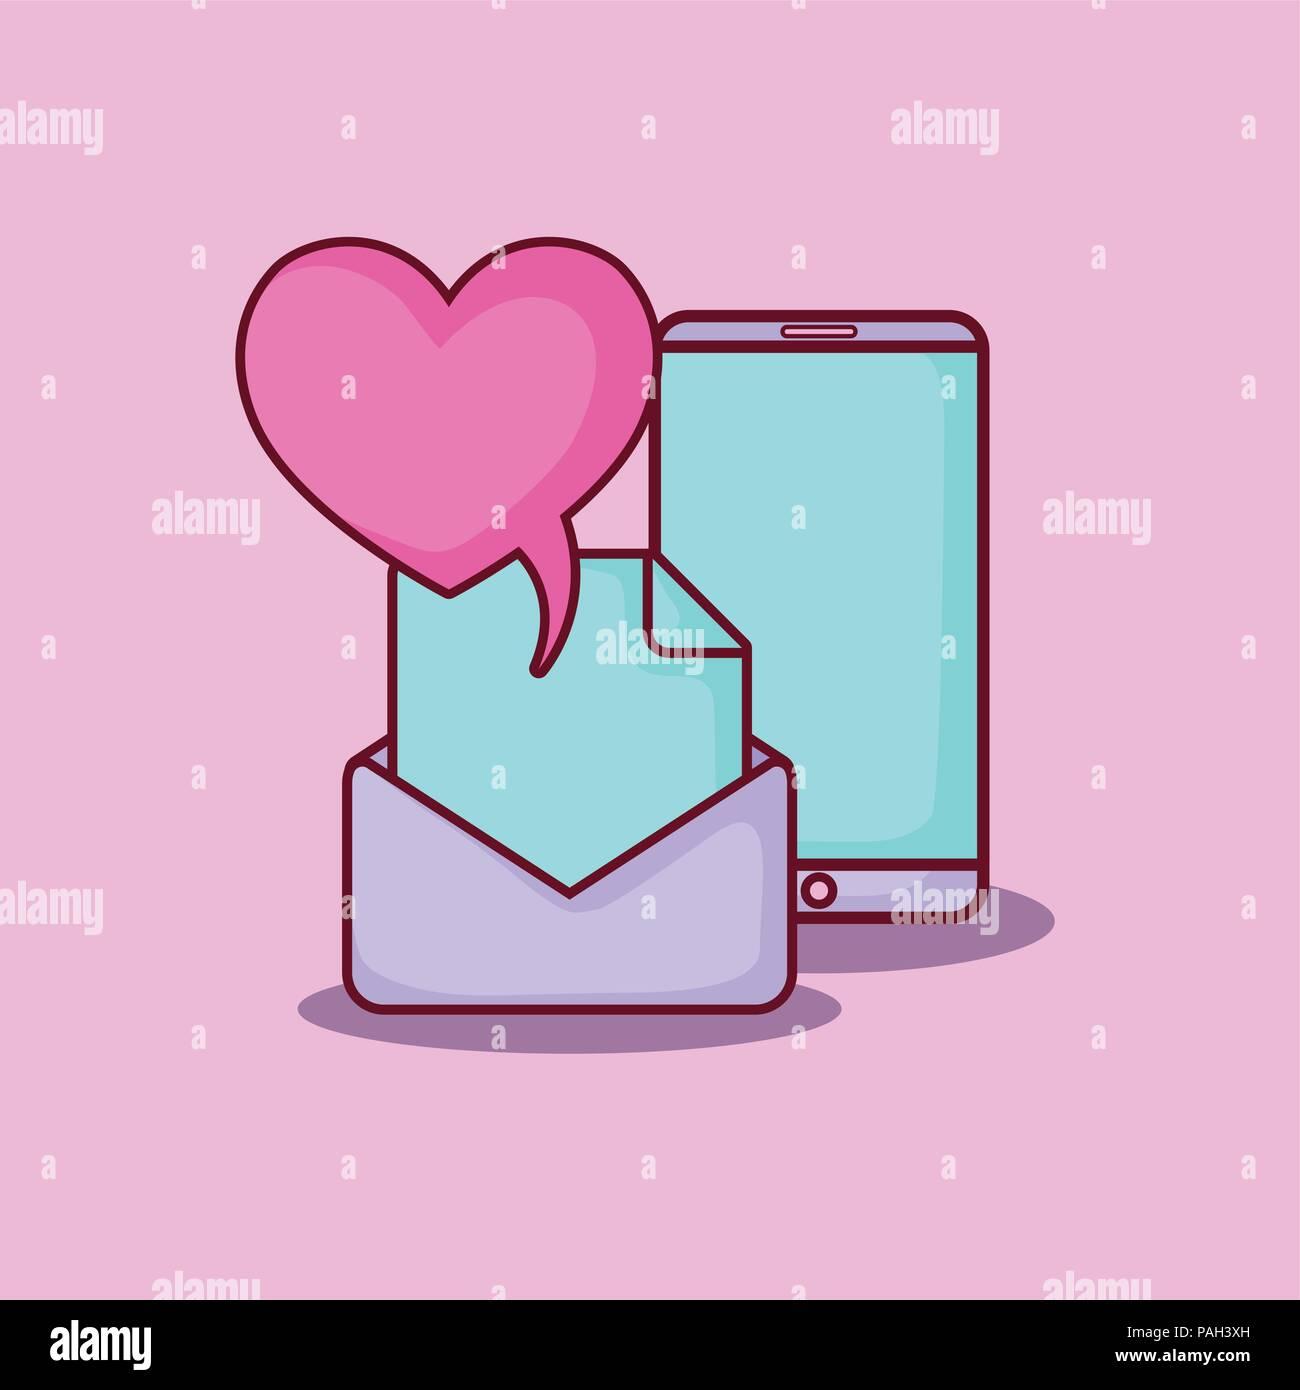 dating website username